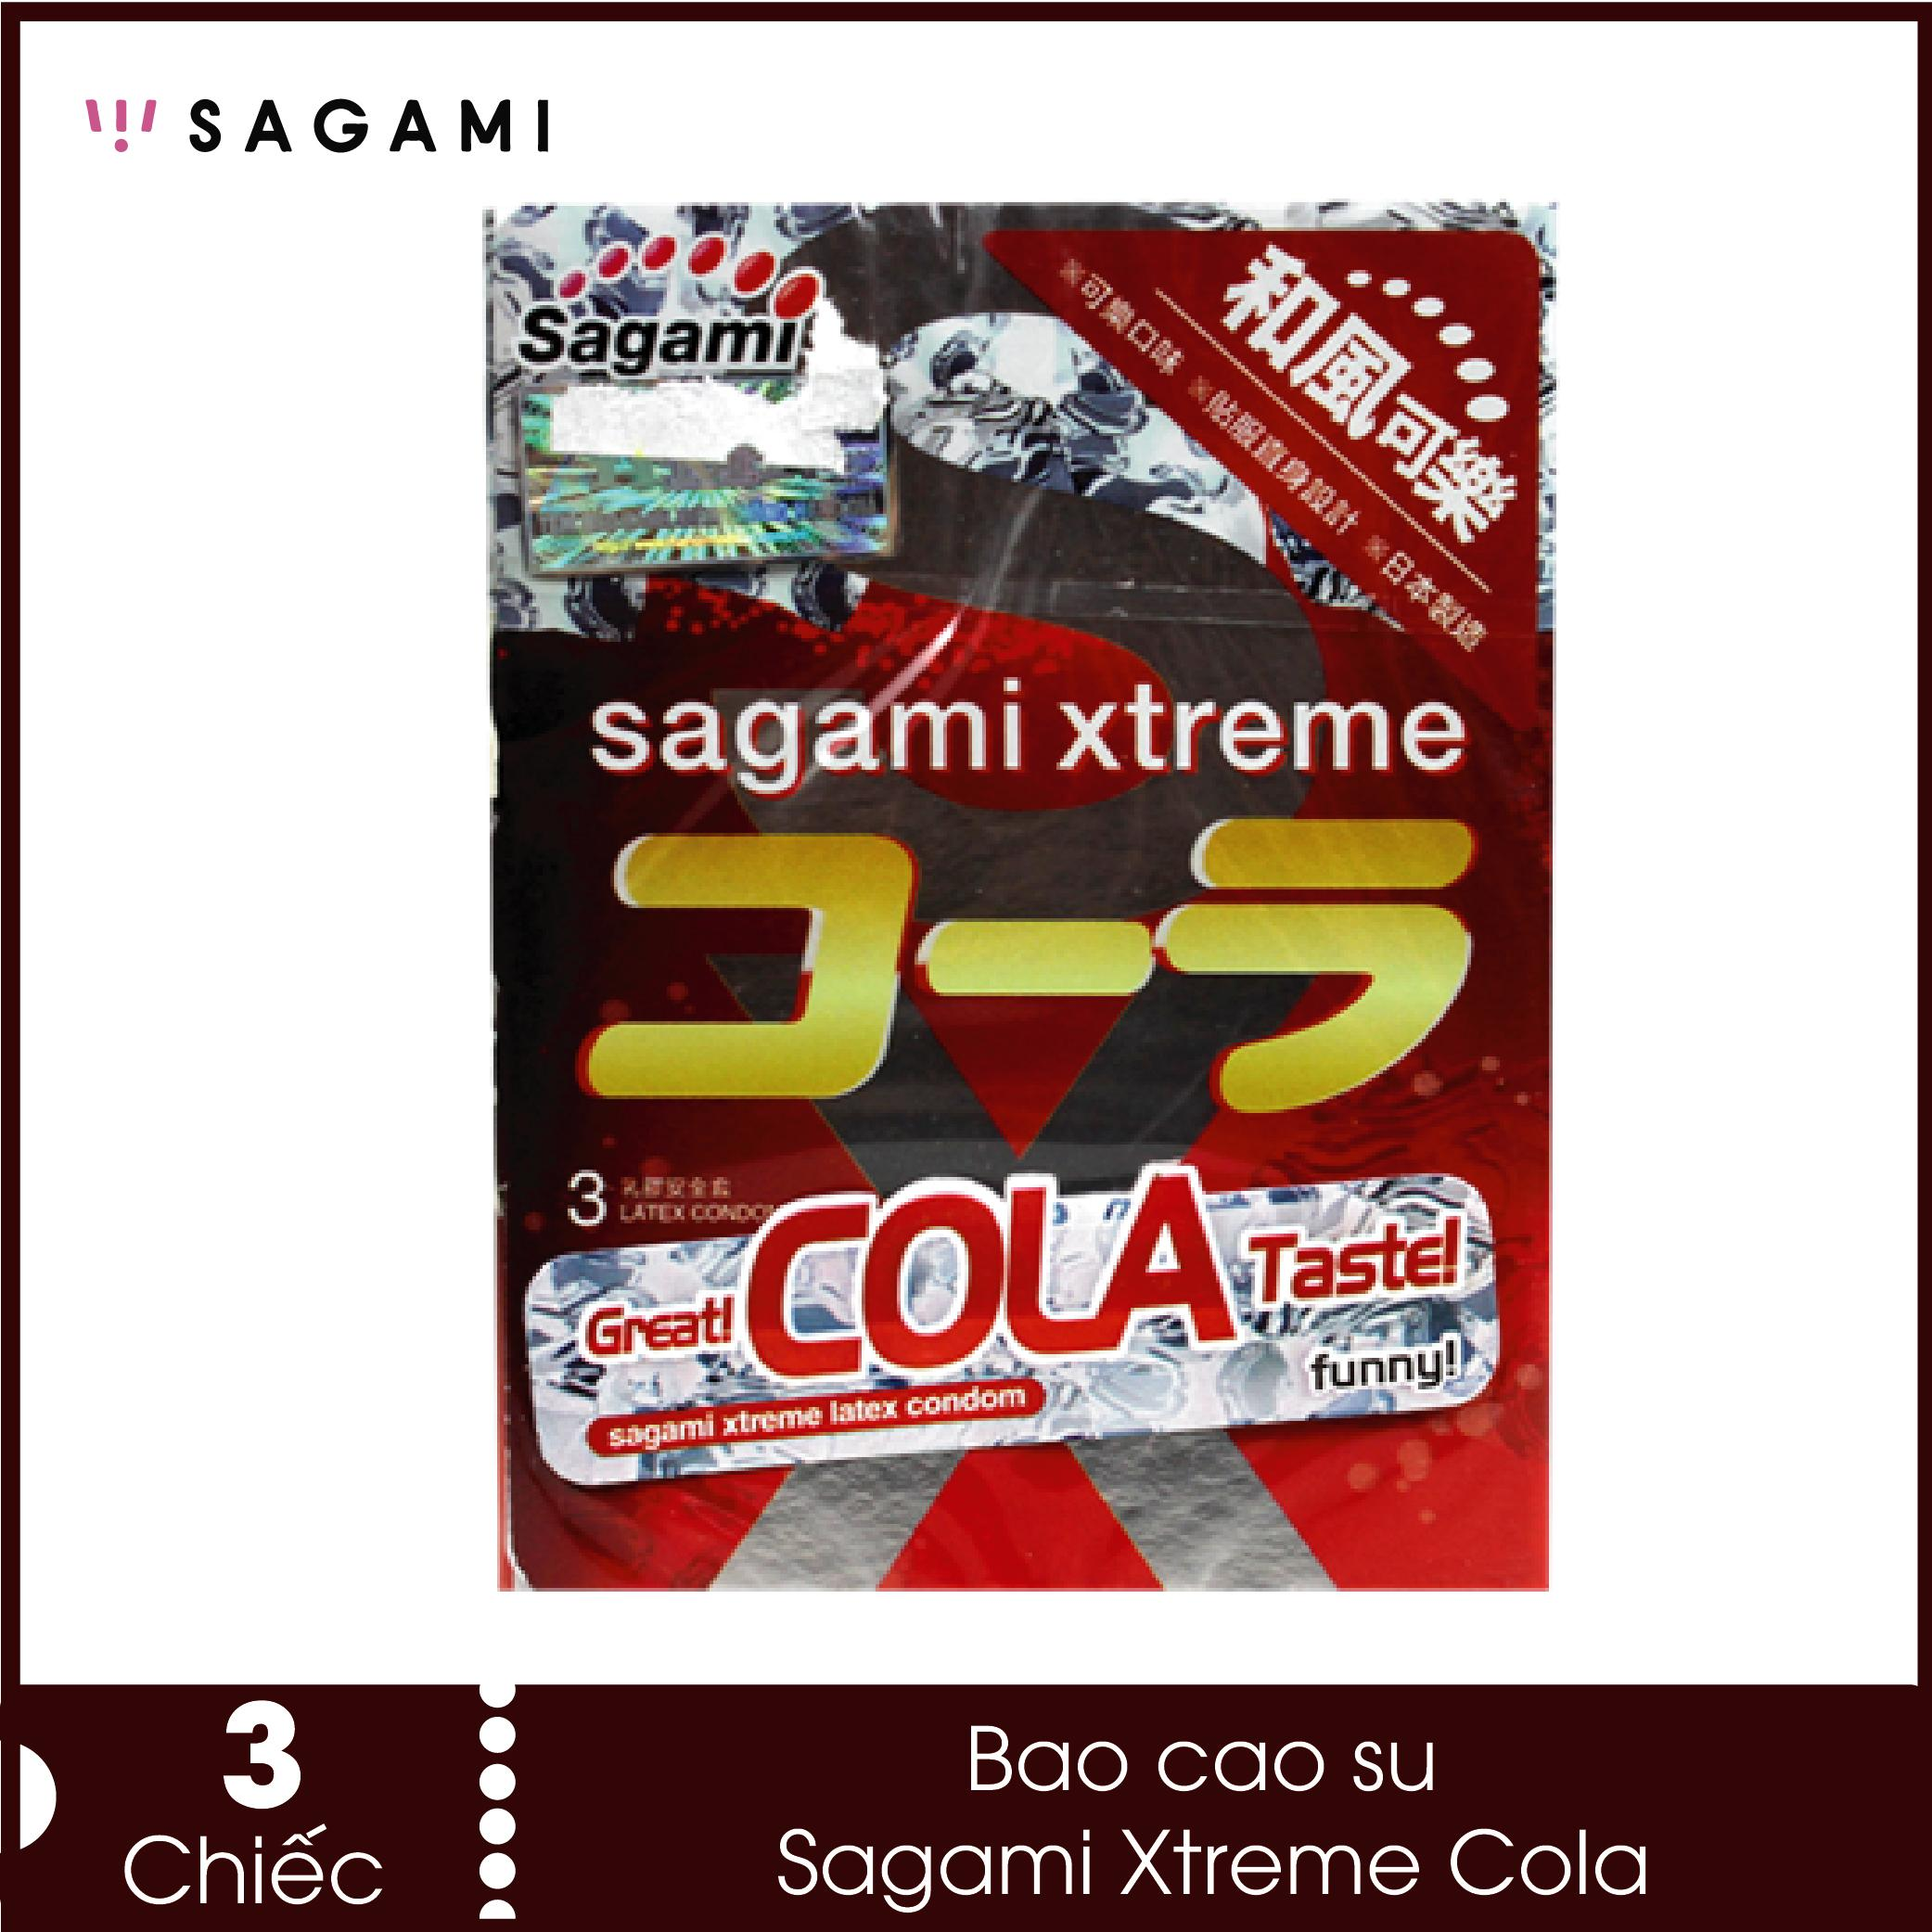 Bao cao su kéo dại thời gian Sagami Cola - mùi Cola siêu độc lạ